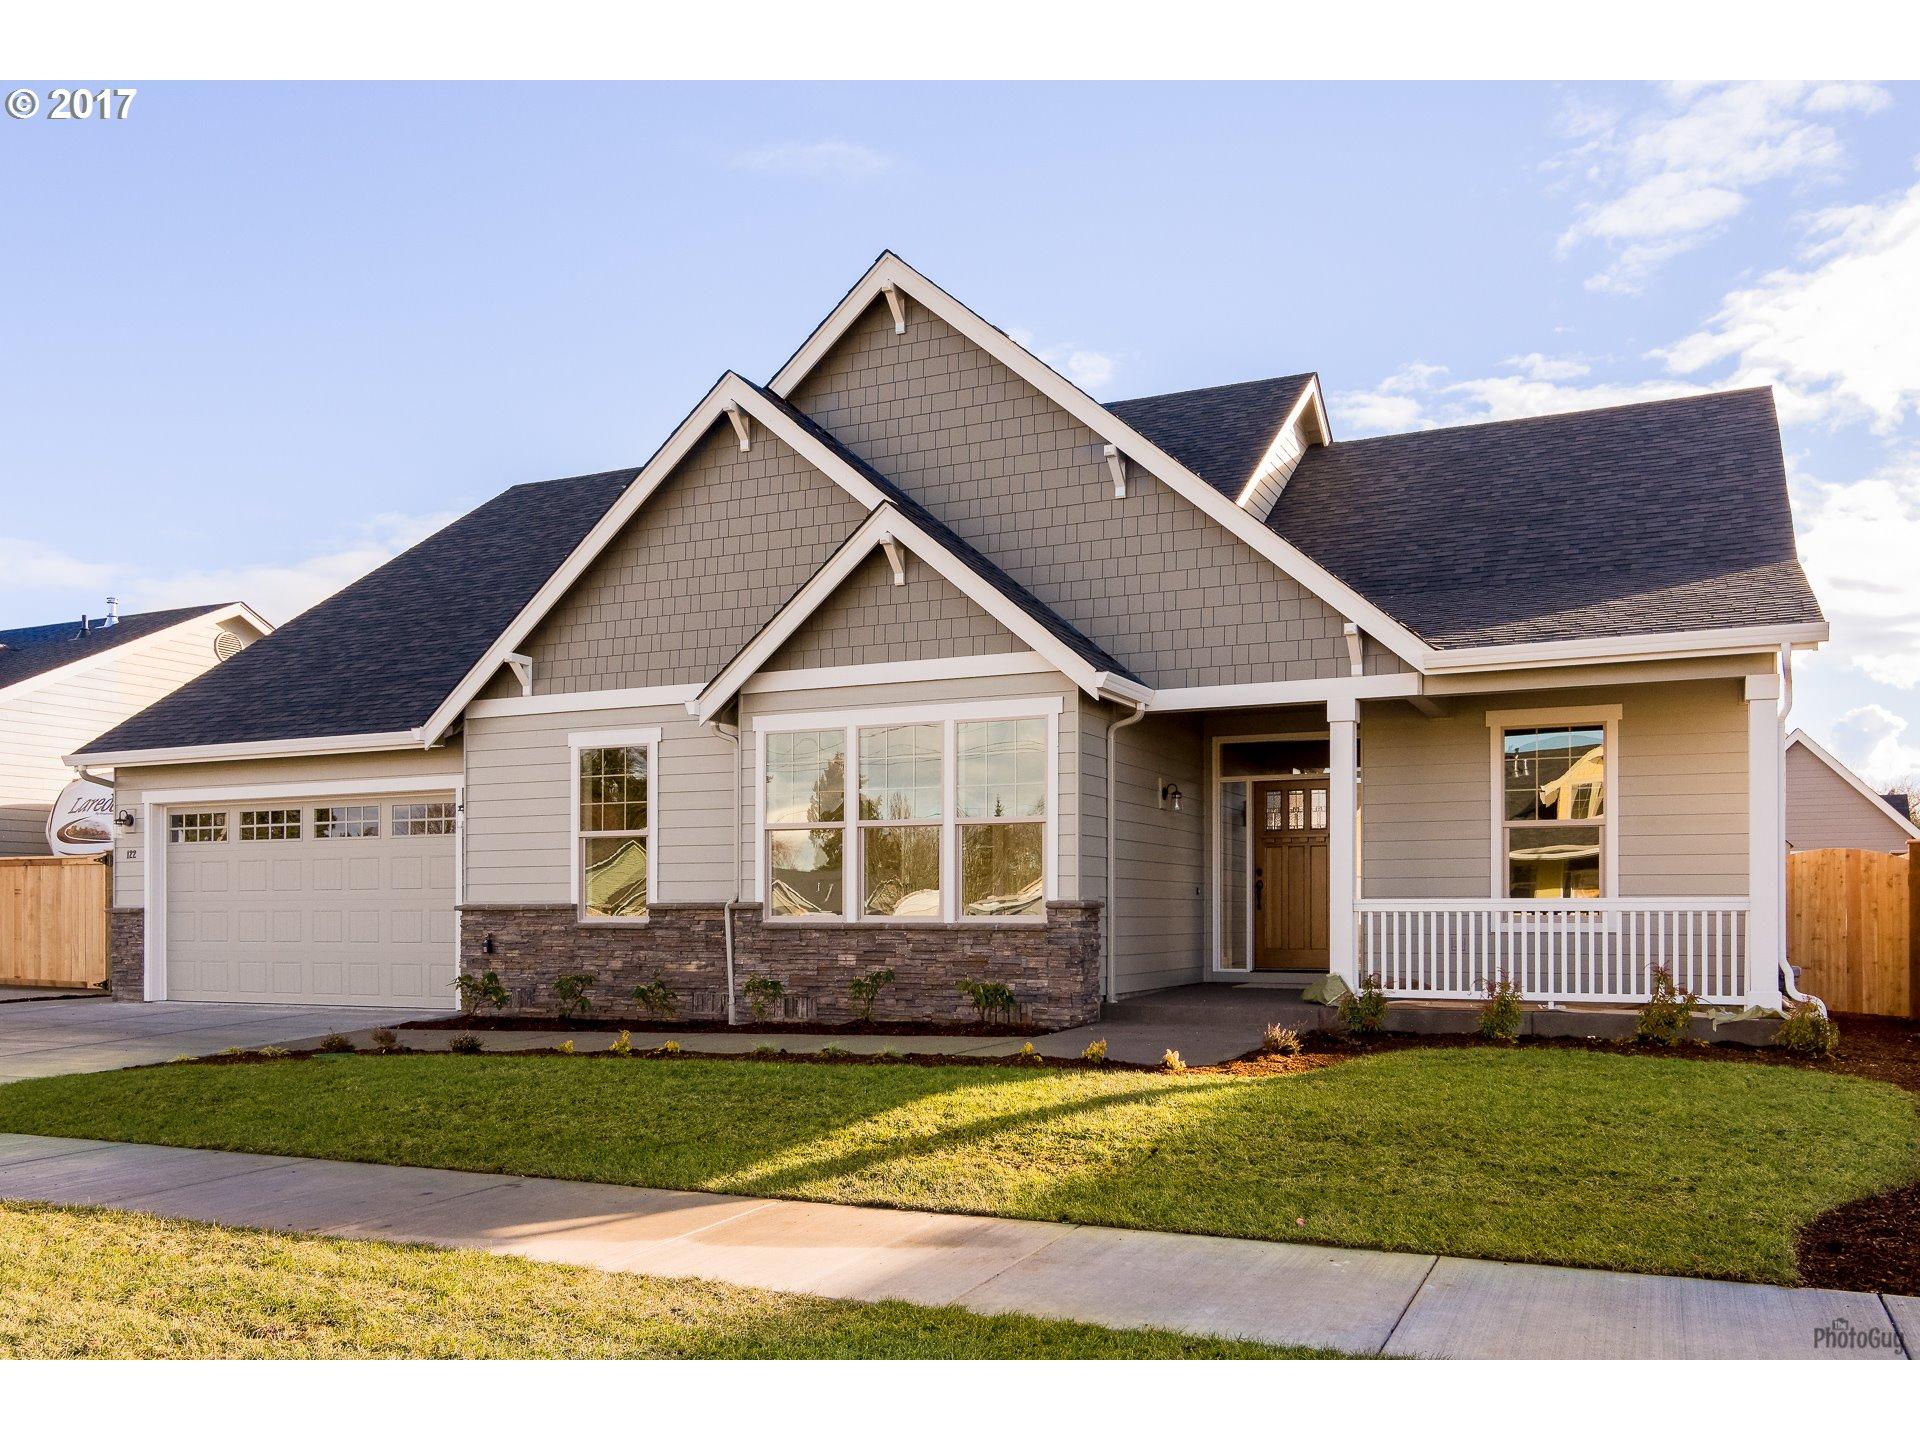 122 W DEAN AVE, Eugene, OR 97404